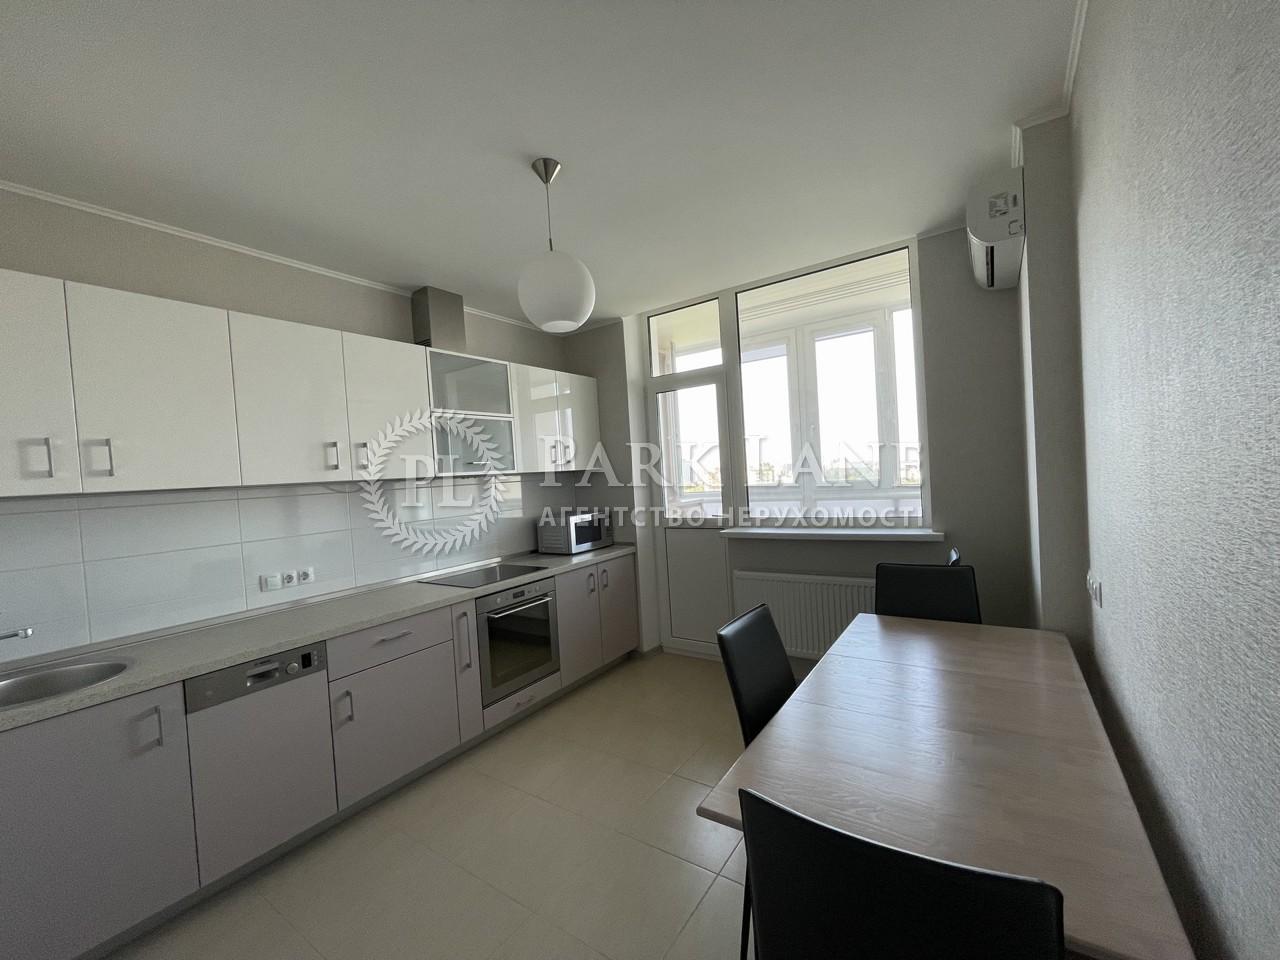 Квартира I-33615, Сикорского Игоря (Танковая), 1б, Киев - Фото 4